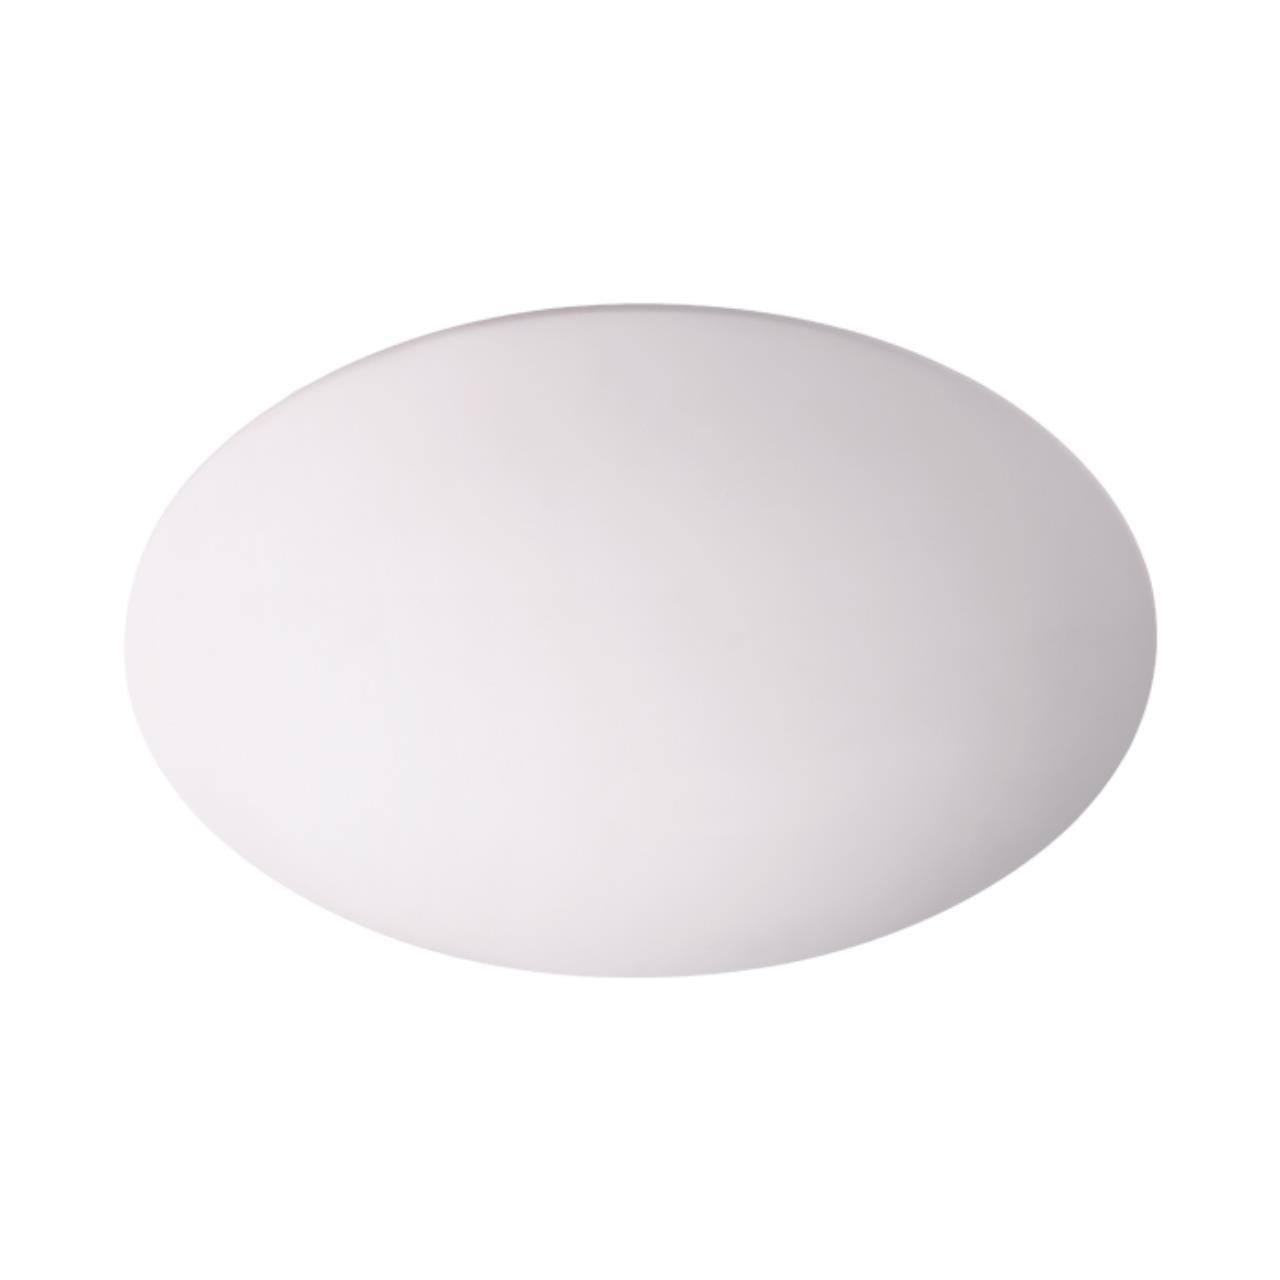 357927 OVER NT19 040 белый Накладной светильник IP20 LED 3000К 4W 220V CAIL